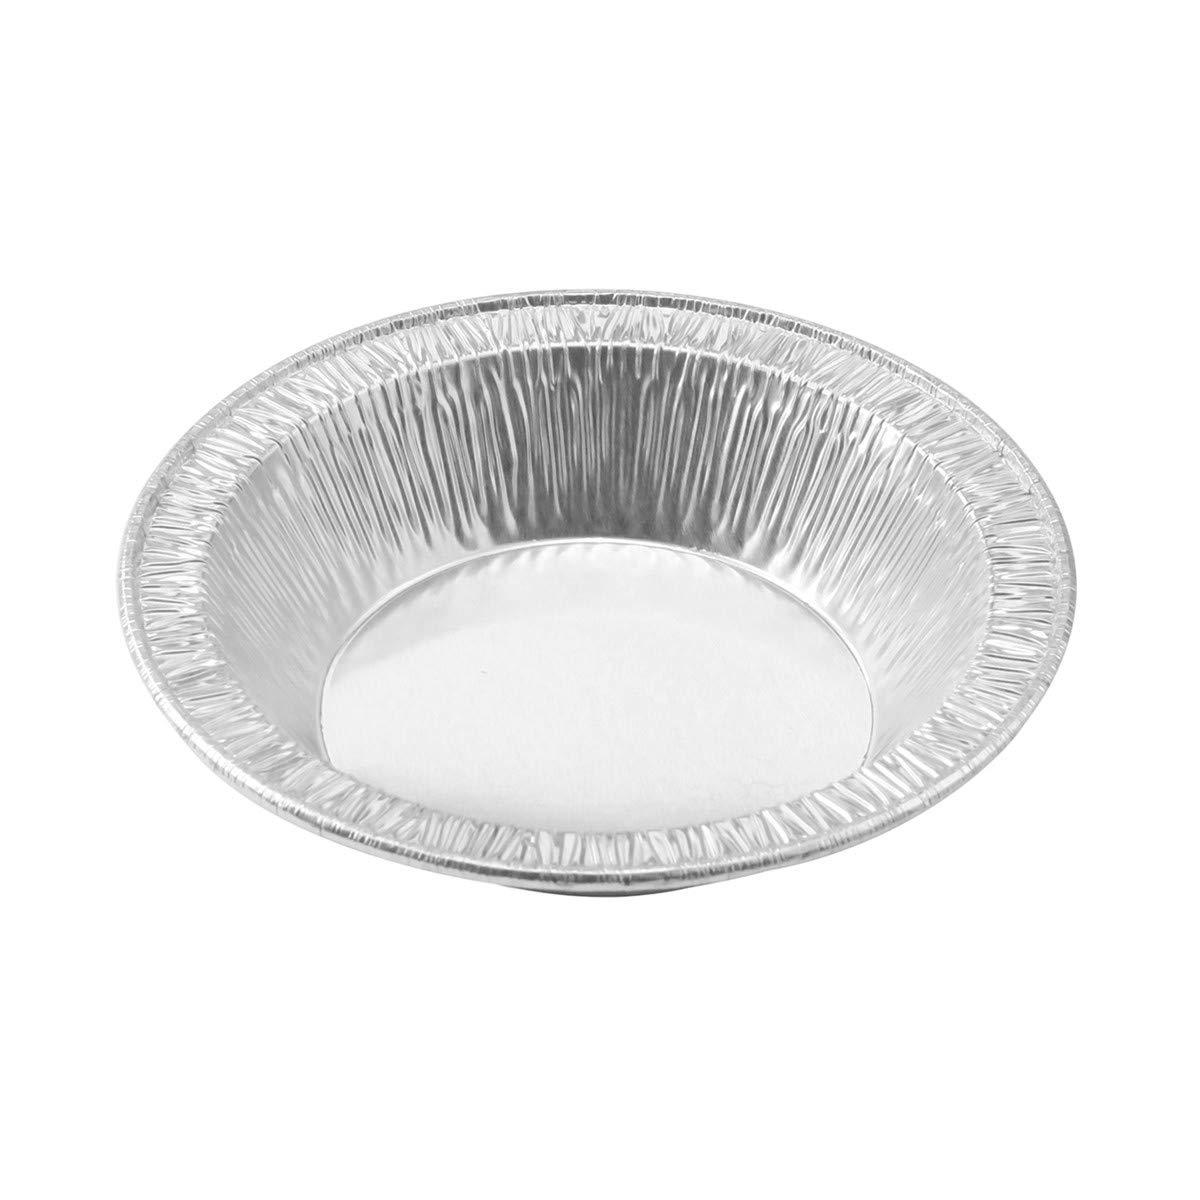 5 oz. Disposable Aluminum 4½'''' Deep Tart/Individual Pie Pan #B13 (1000) by KitchenDance